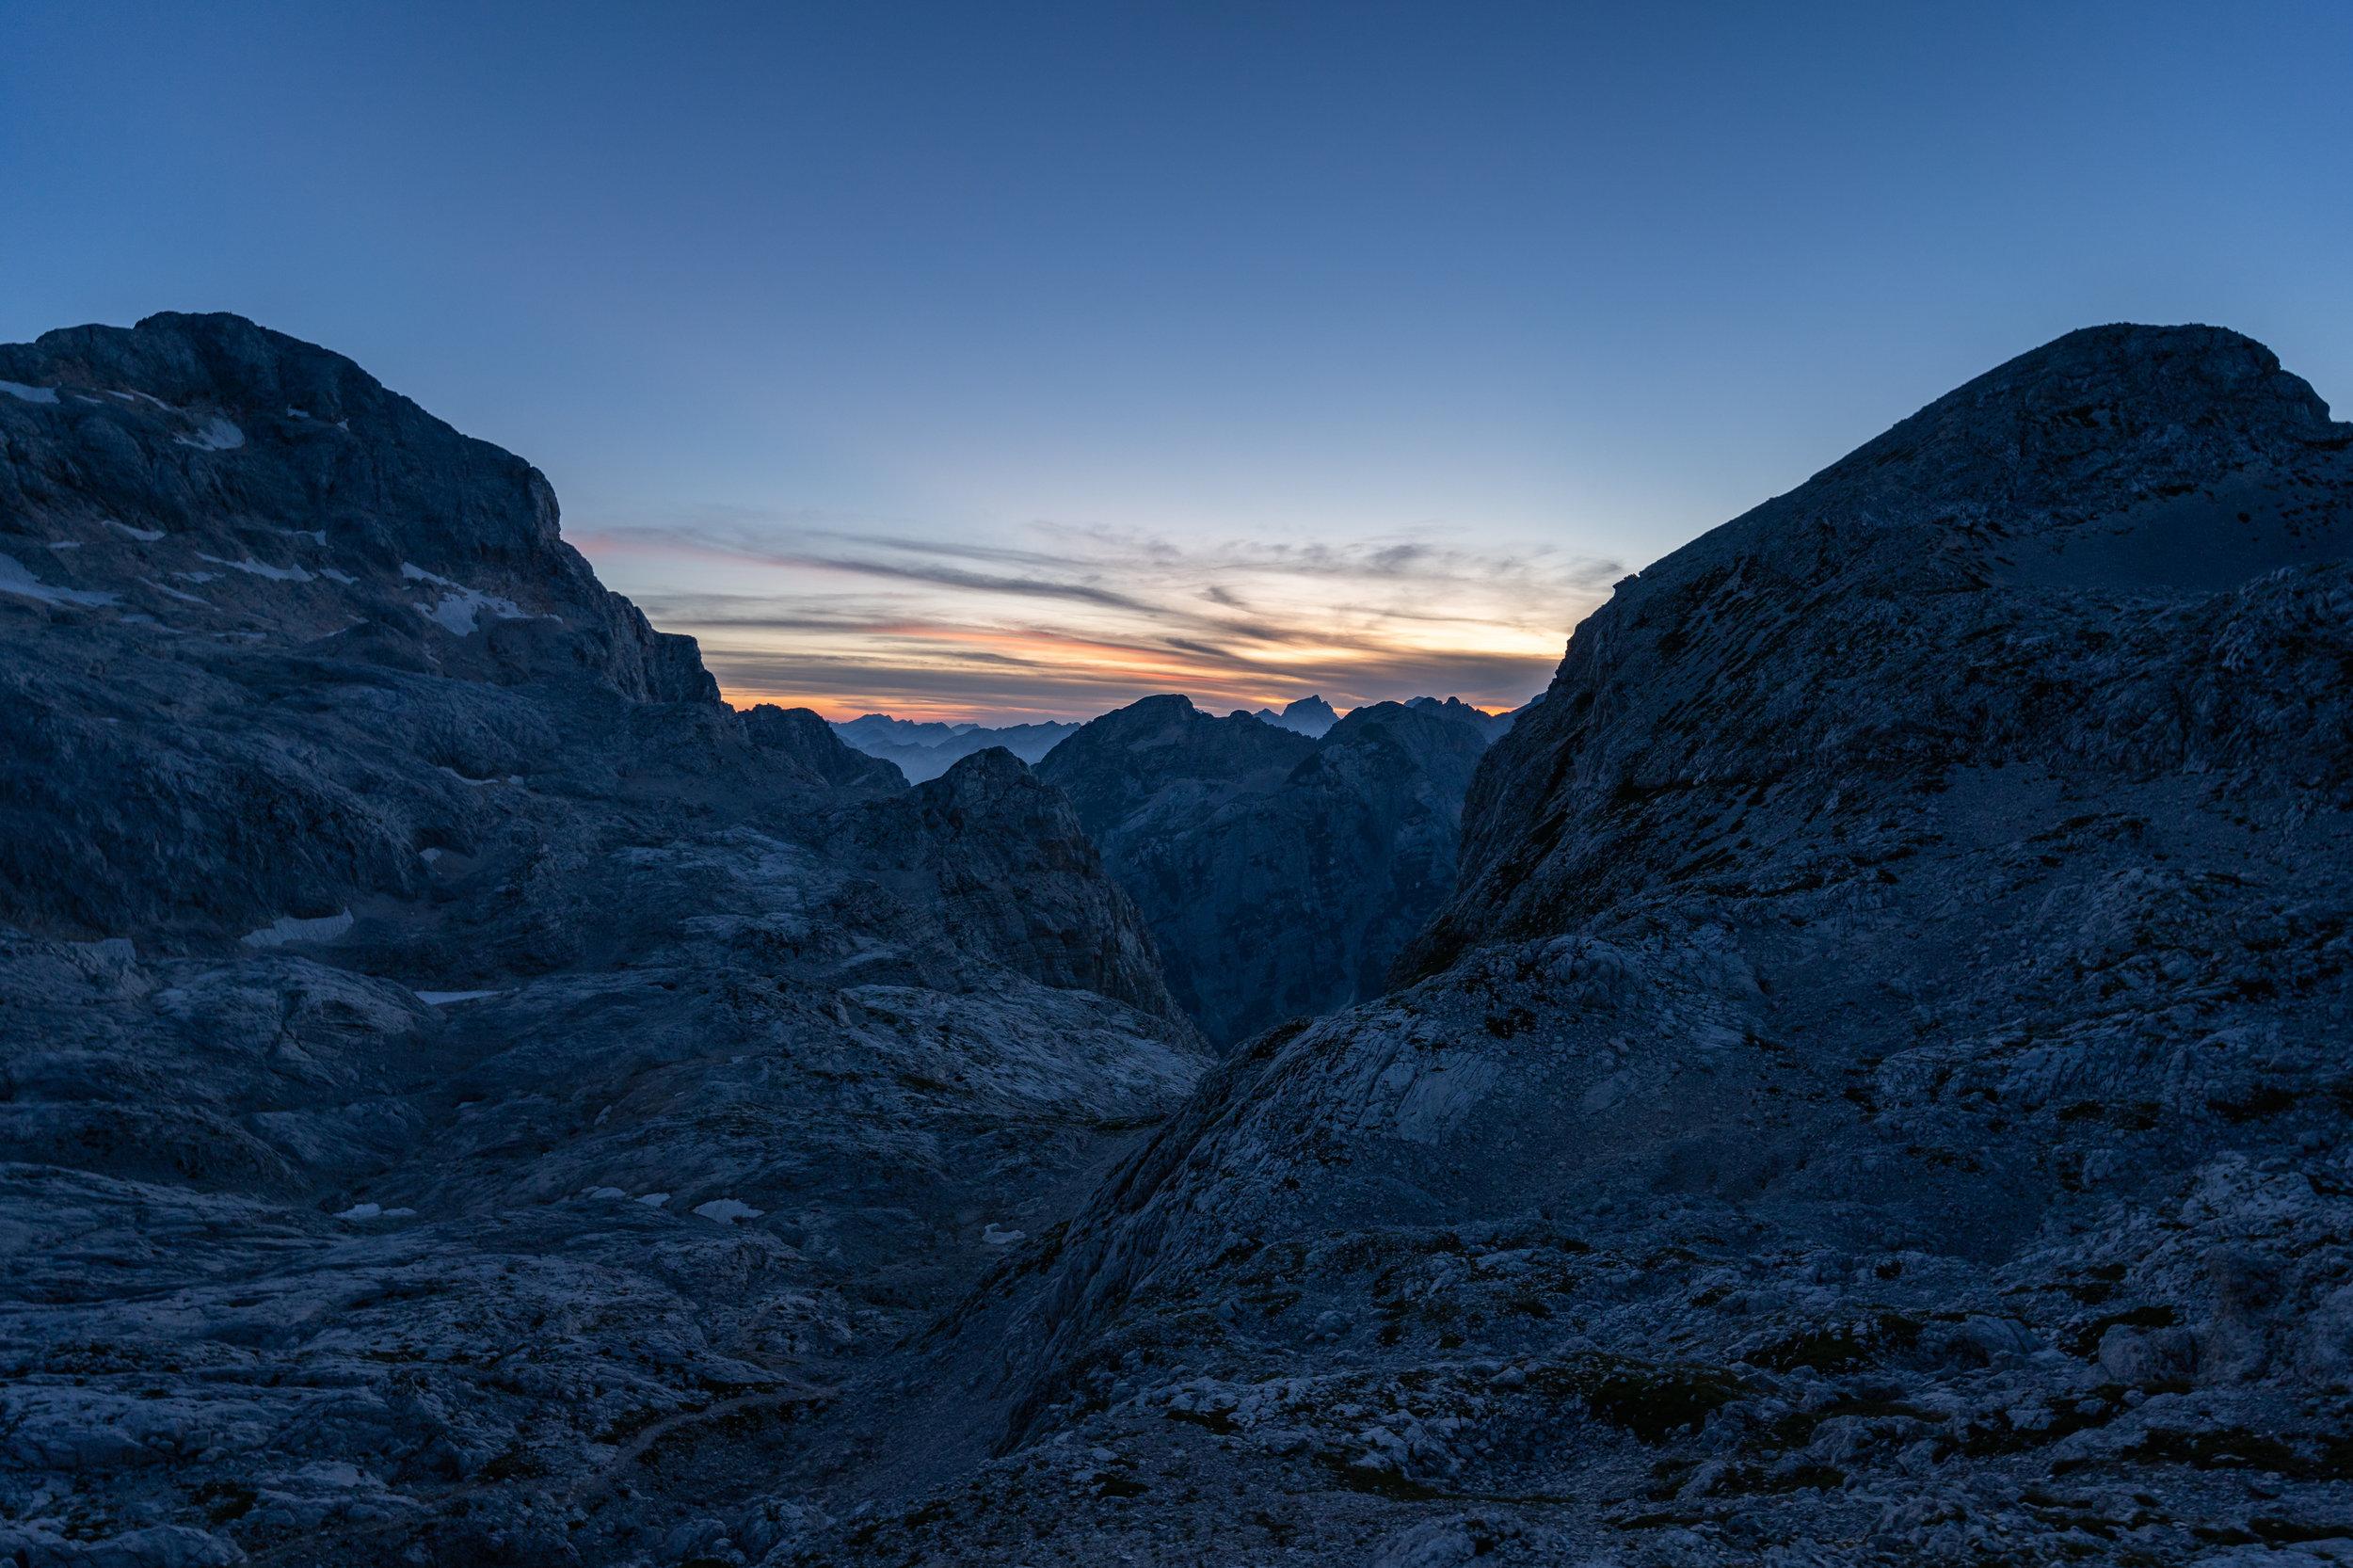 Evening at the mountain hut, looking towards Mt. Triglav (left), Mt. Begunjski vrh (right) and Mt. Jalovec (back).